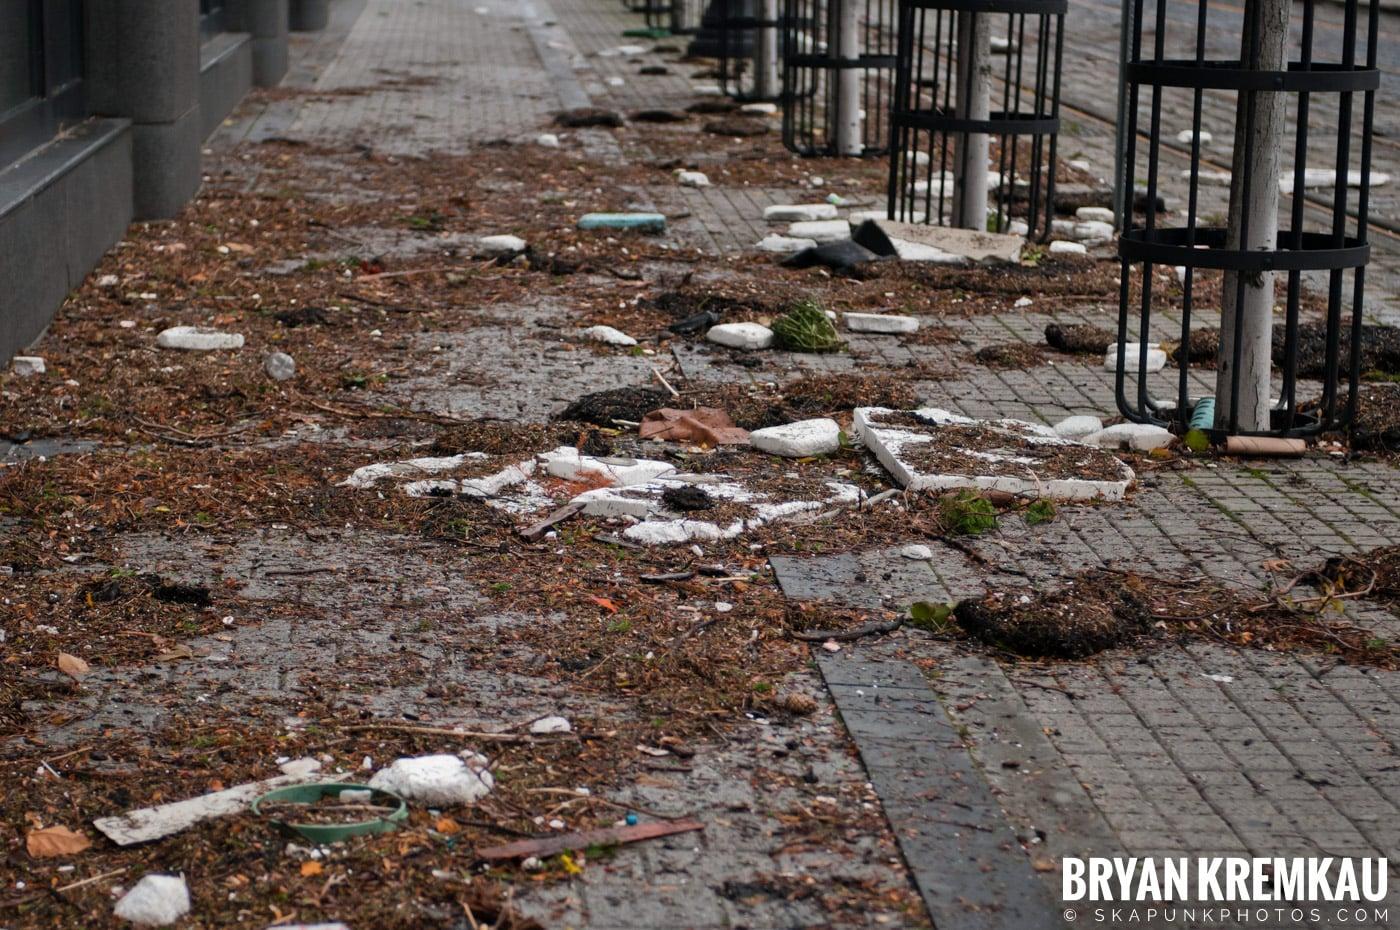 Hurricane Sandy 2012 @ Paulus Hook, Jersey City - 10.29.12 - 10.30.12 (2)